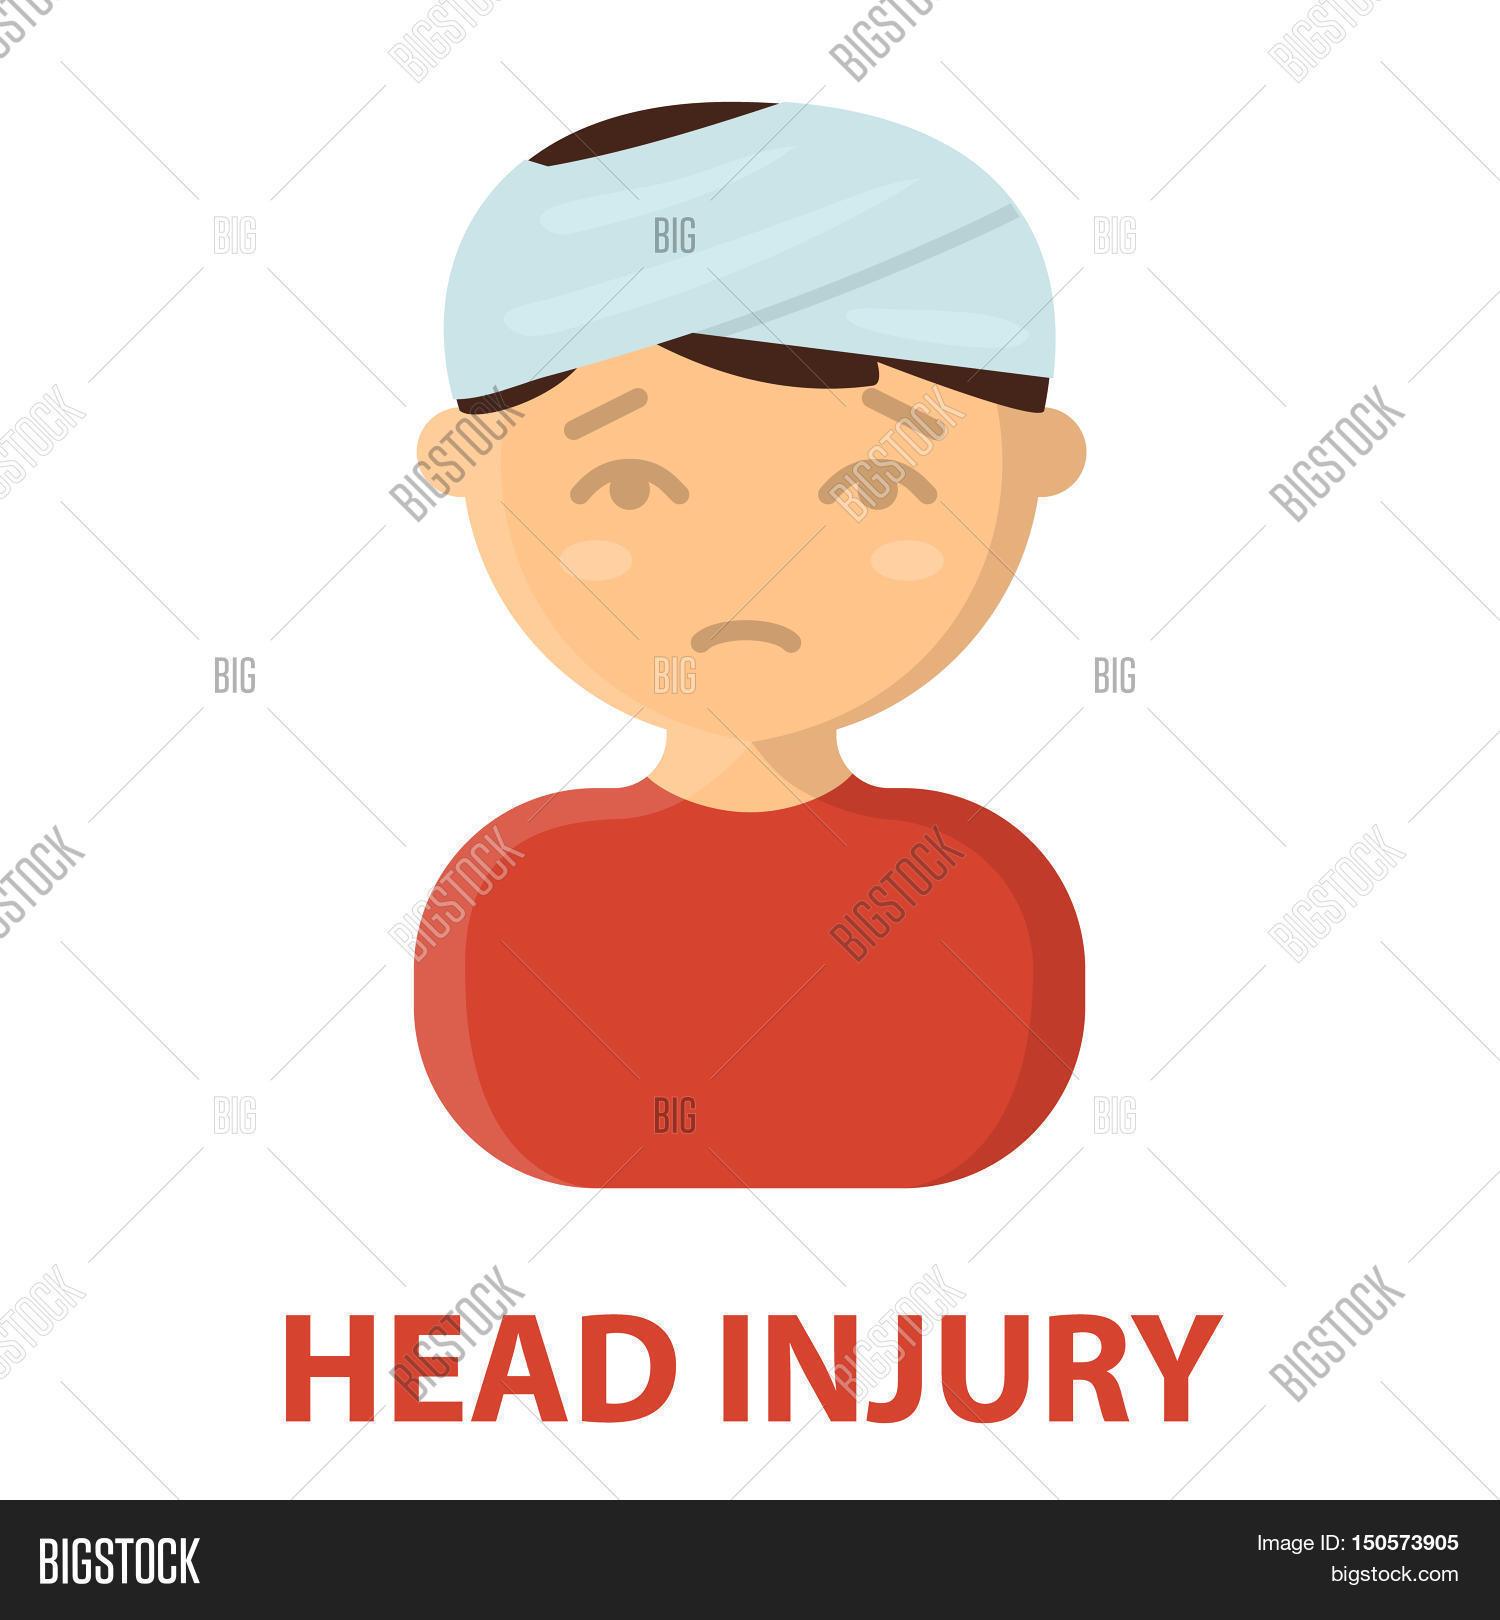 Head Injury Icon Image & Photo (Free Trial)   Bigstock